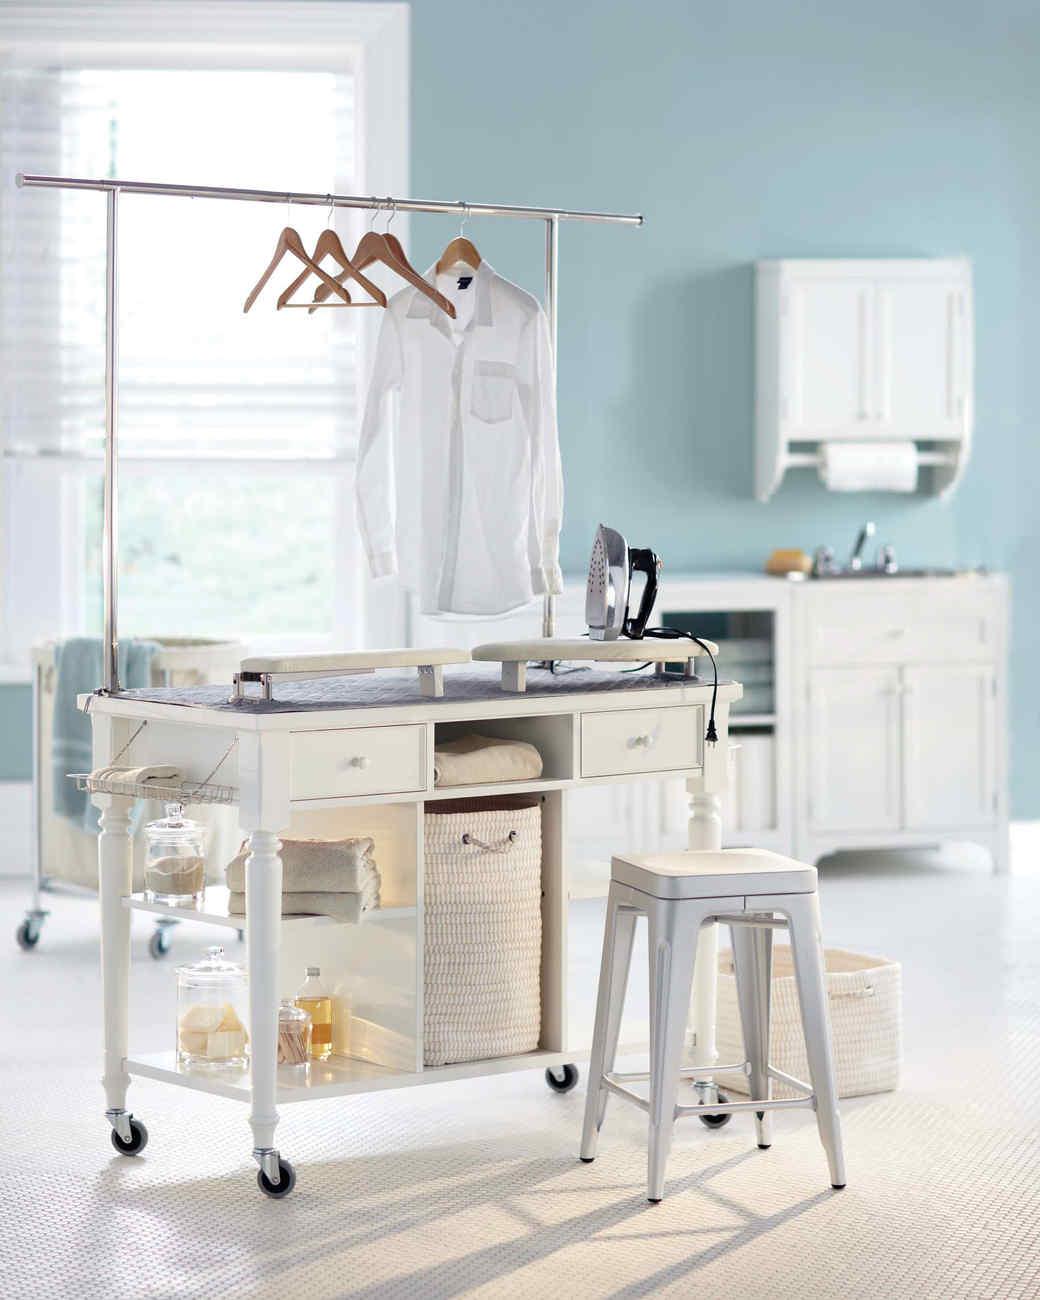 12 Essential Laundry Room Organizing Ideas